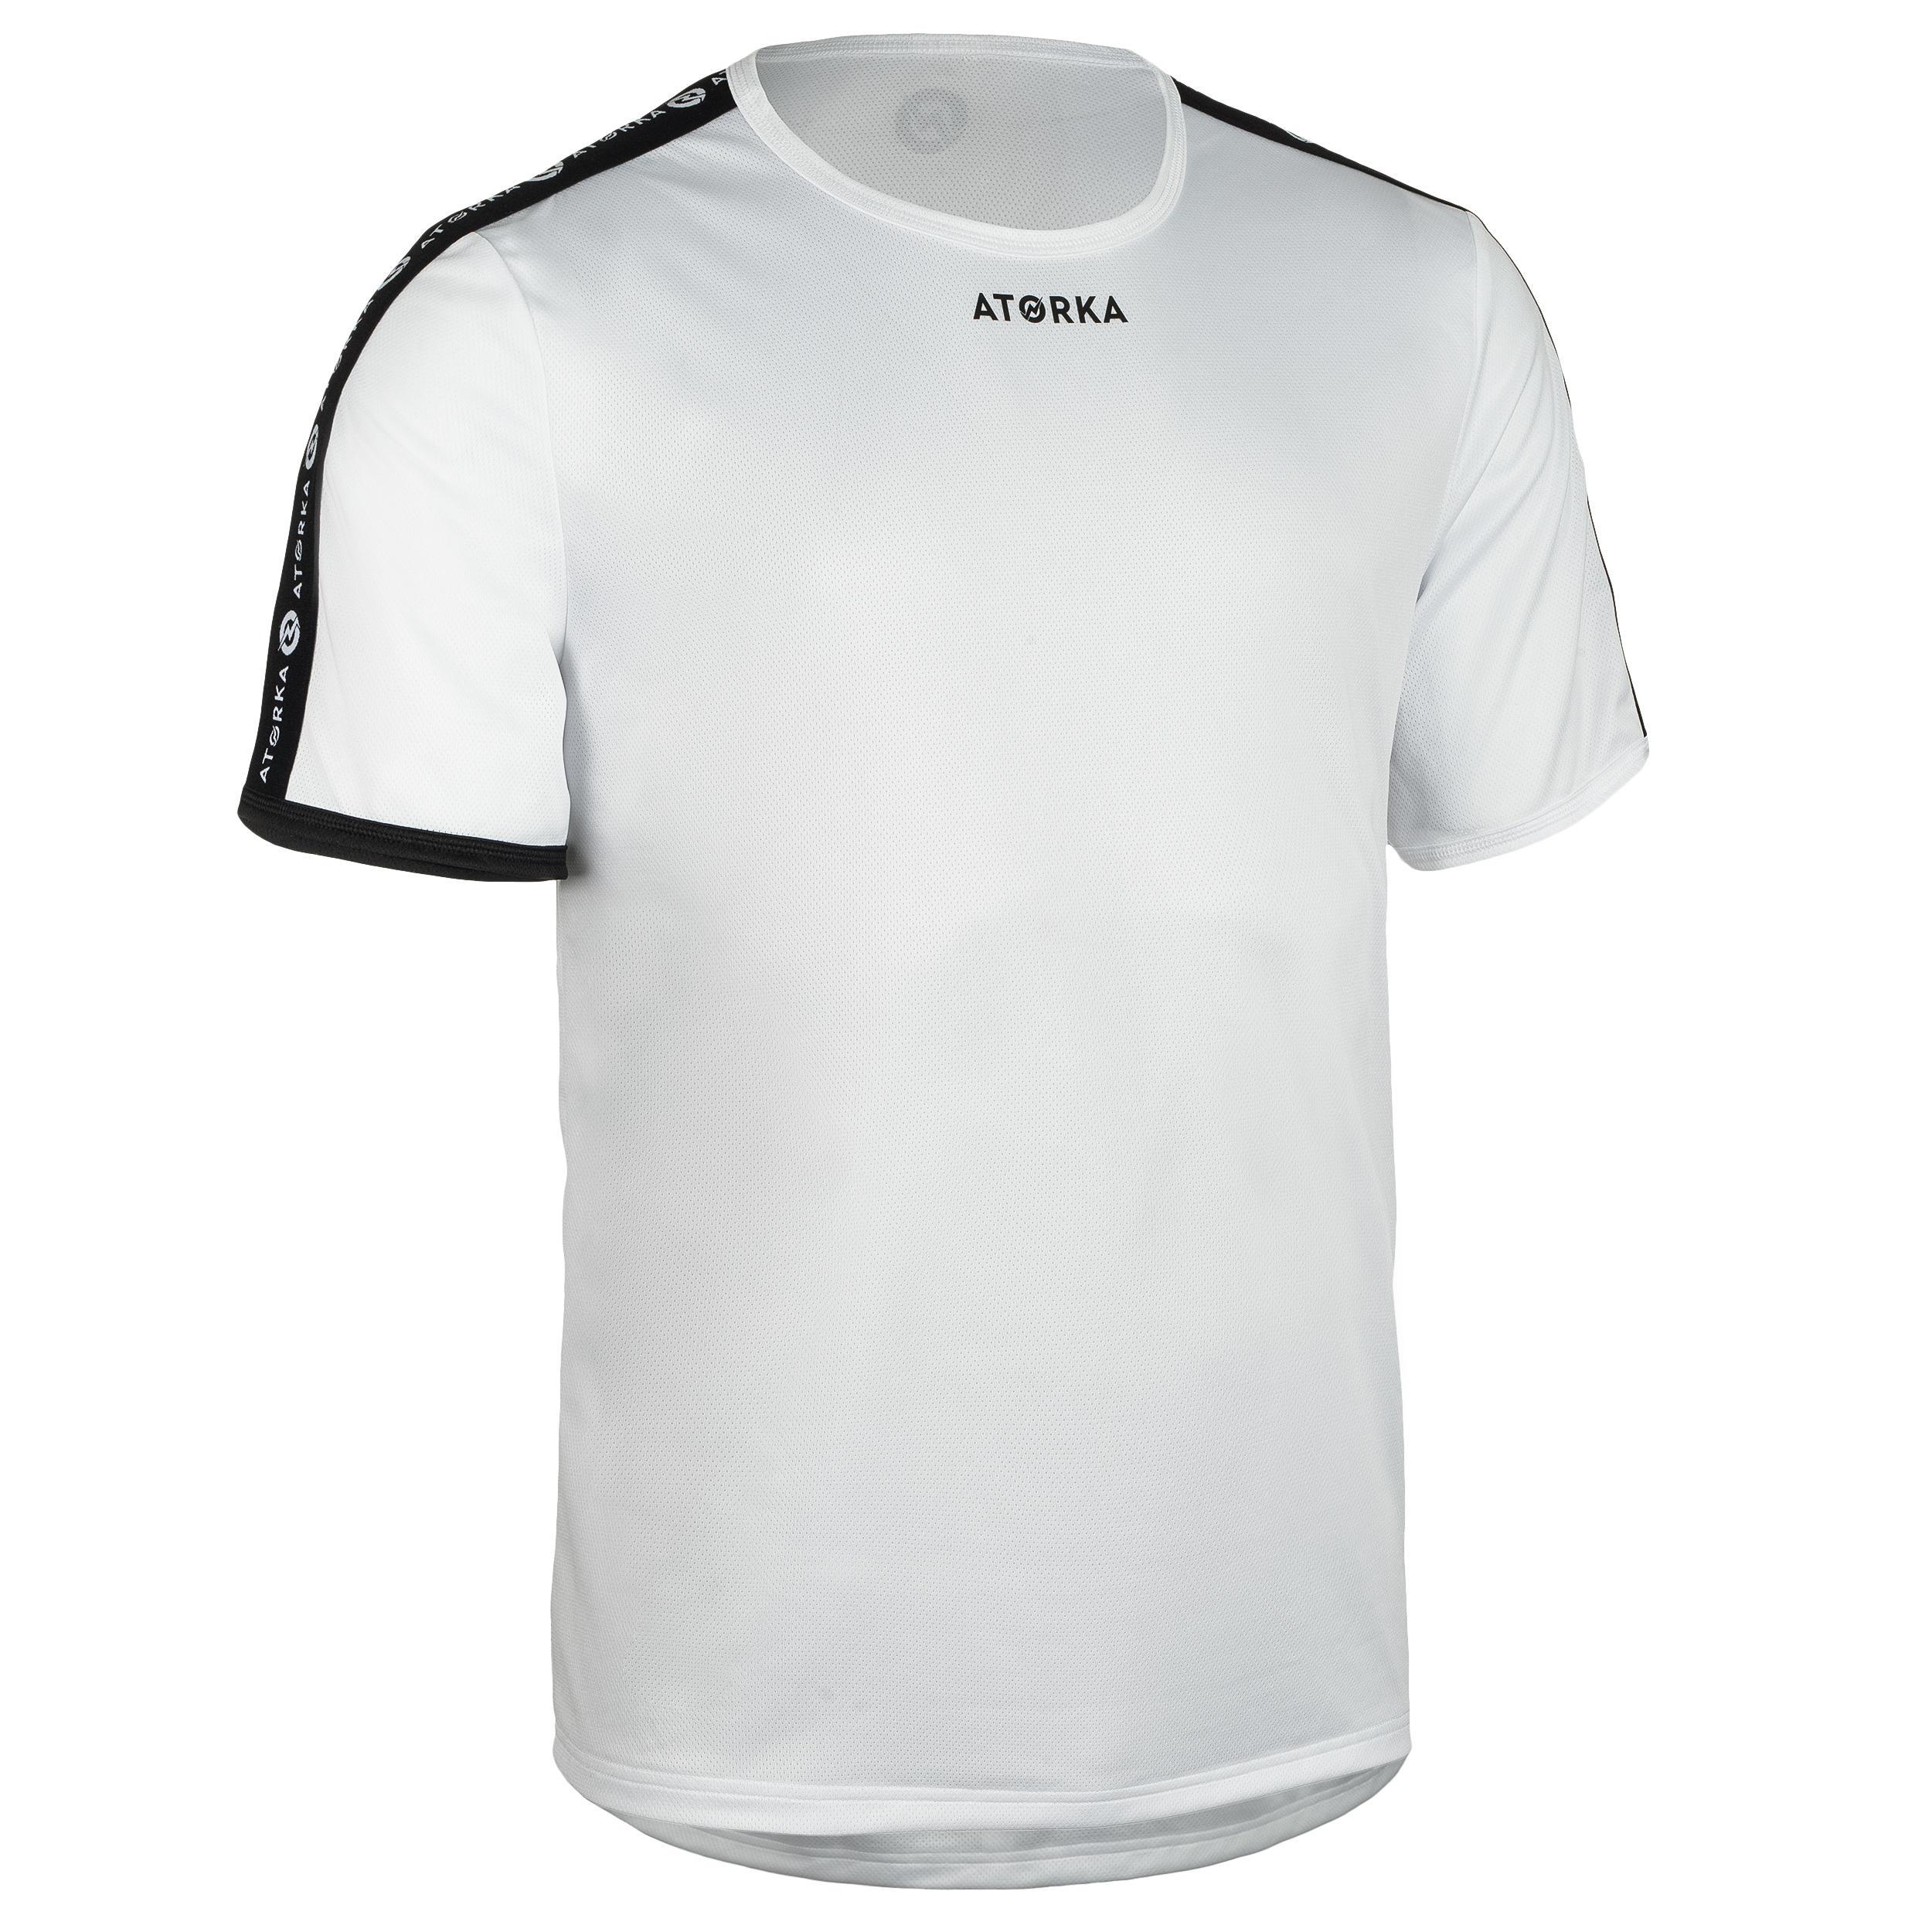 Maillot manches courtes de handball homme h100c blanc atorka